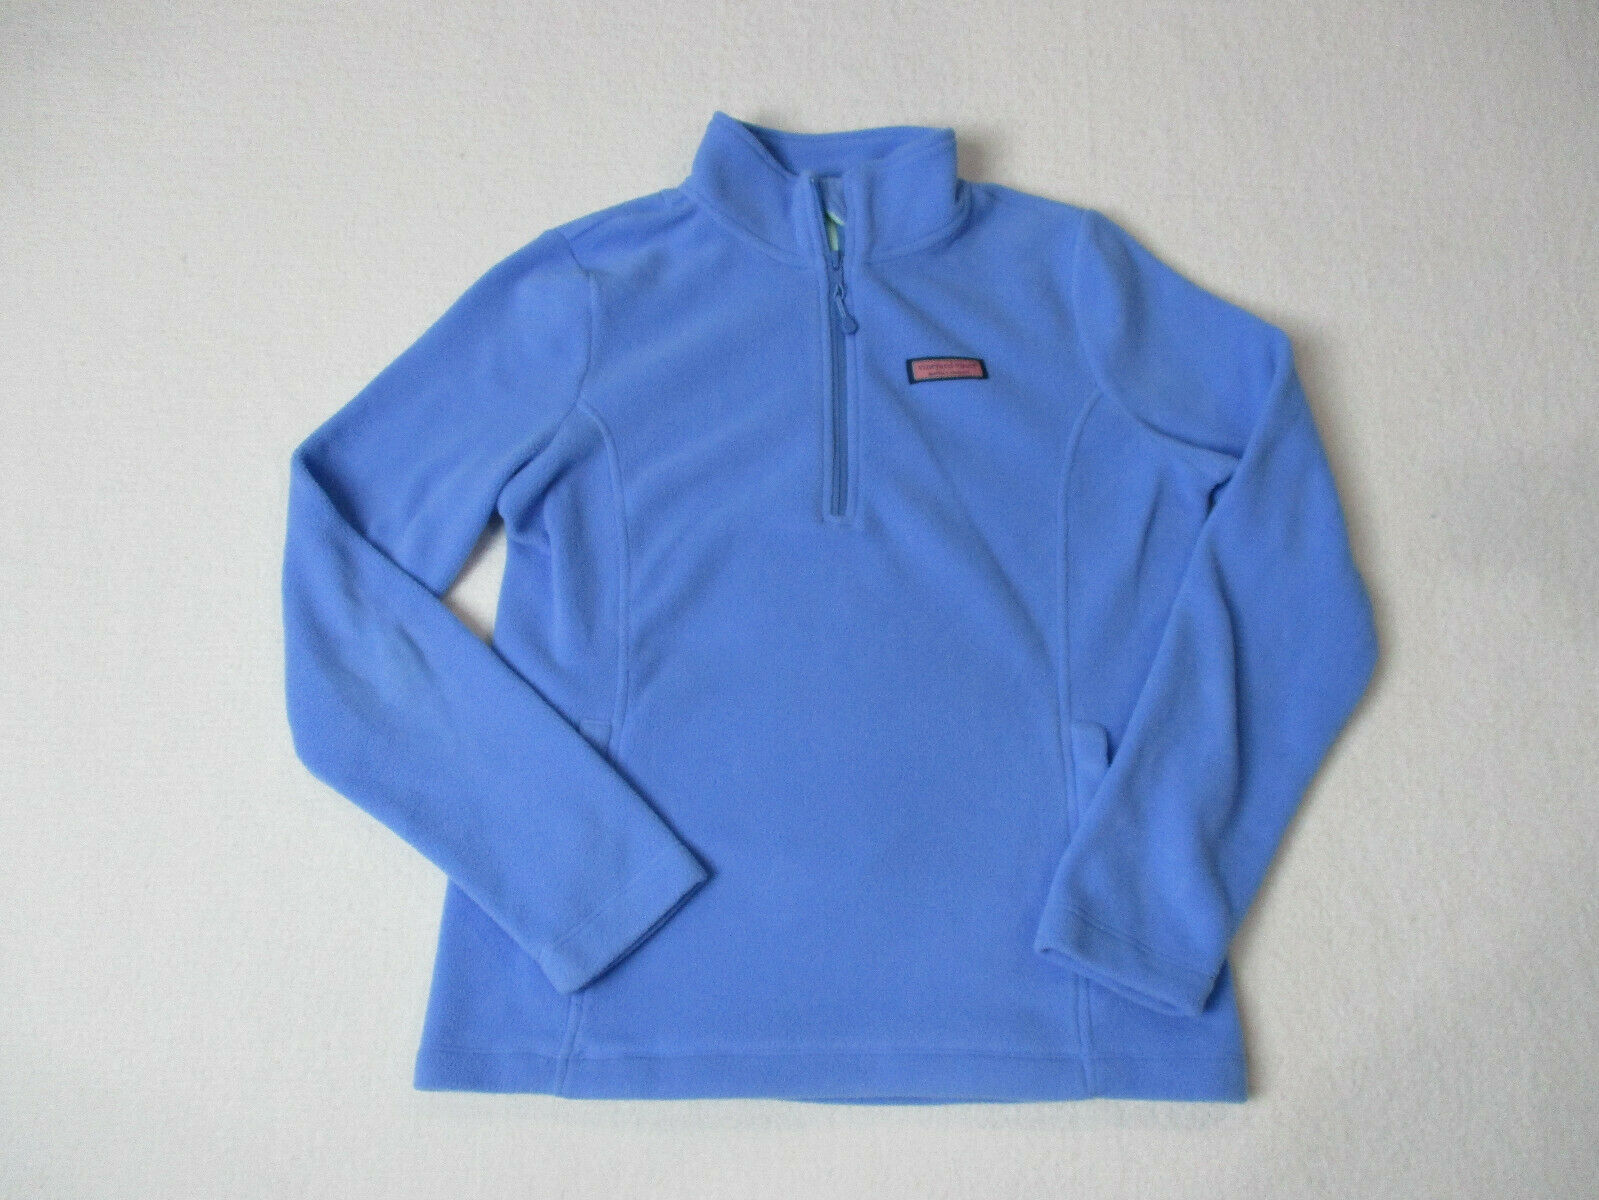 Vineyard Vines Quarter Zip Sweater Womens Extra Small Light bluee Whale Ladies